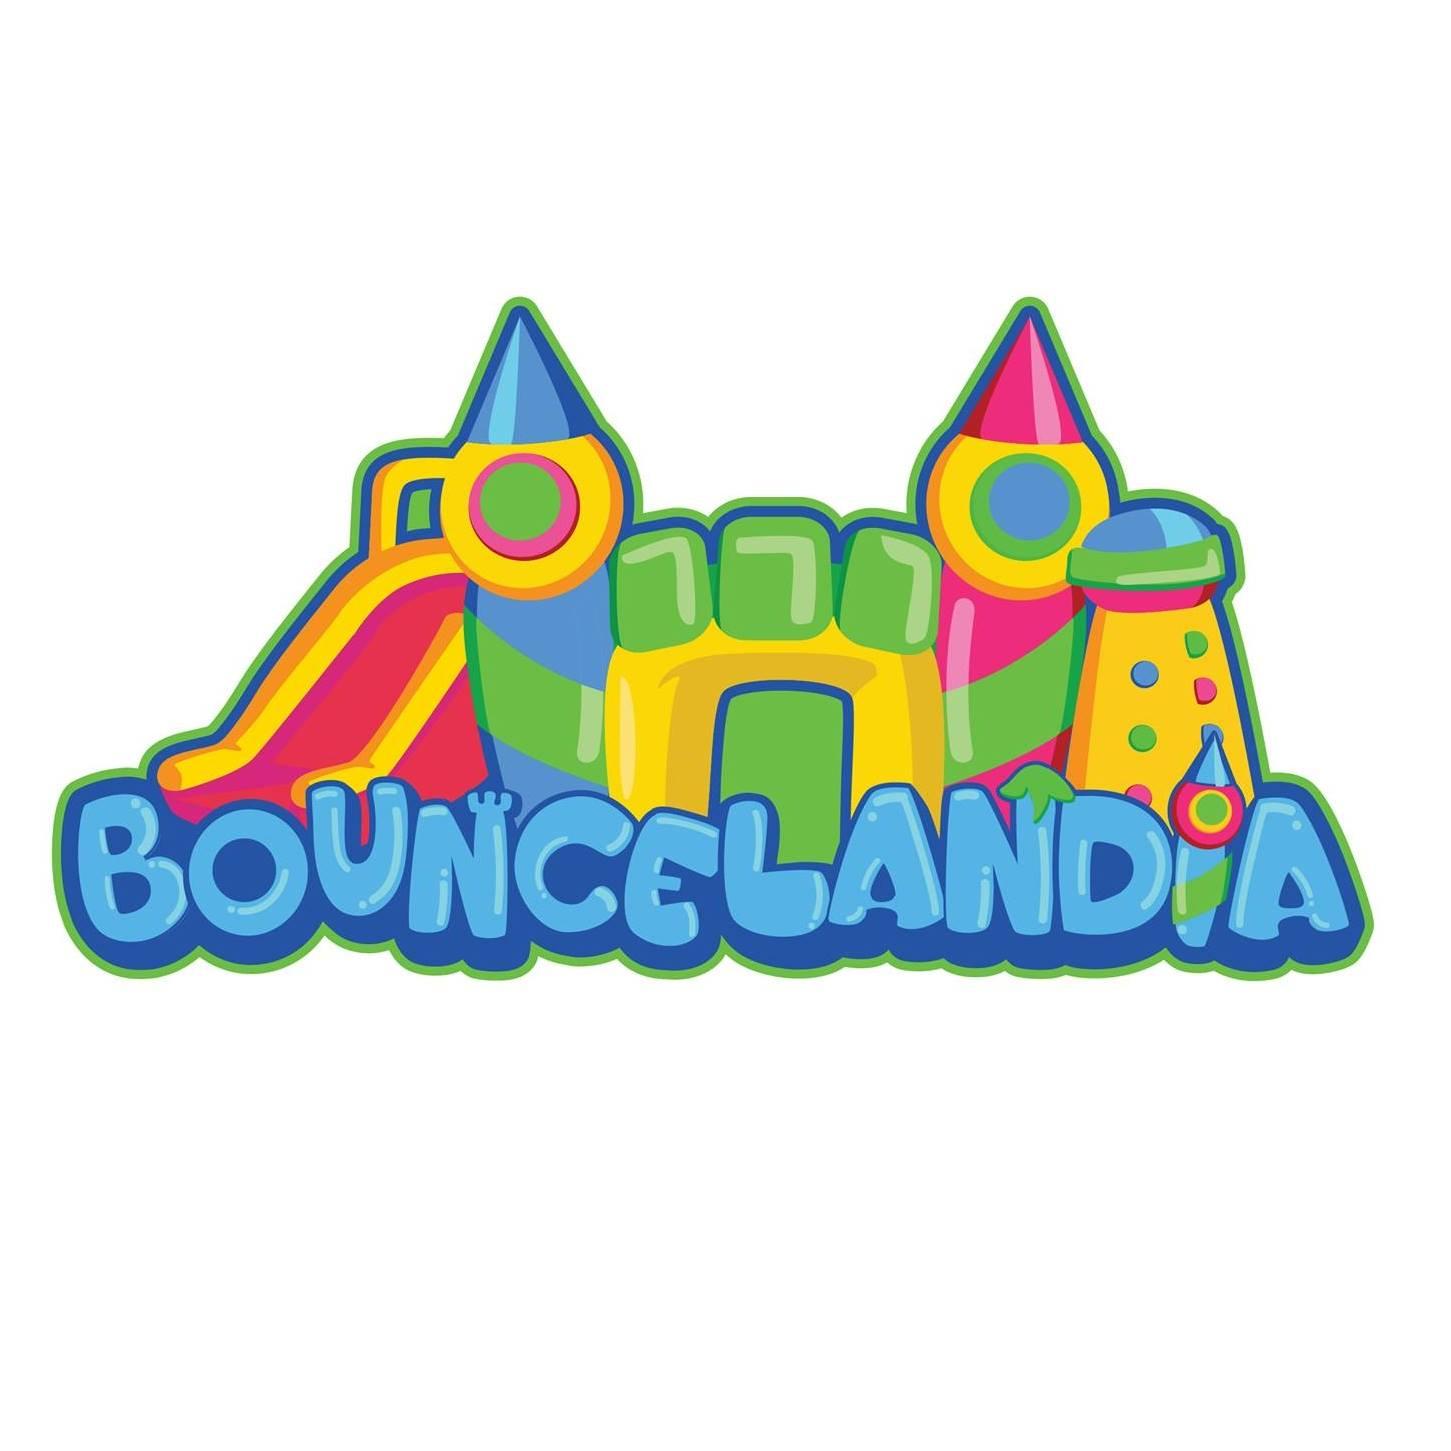 Bouncelandia